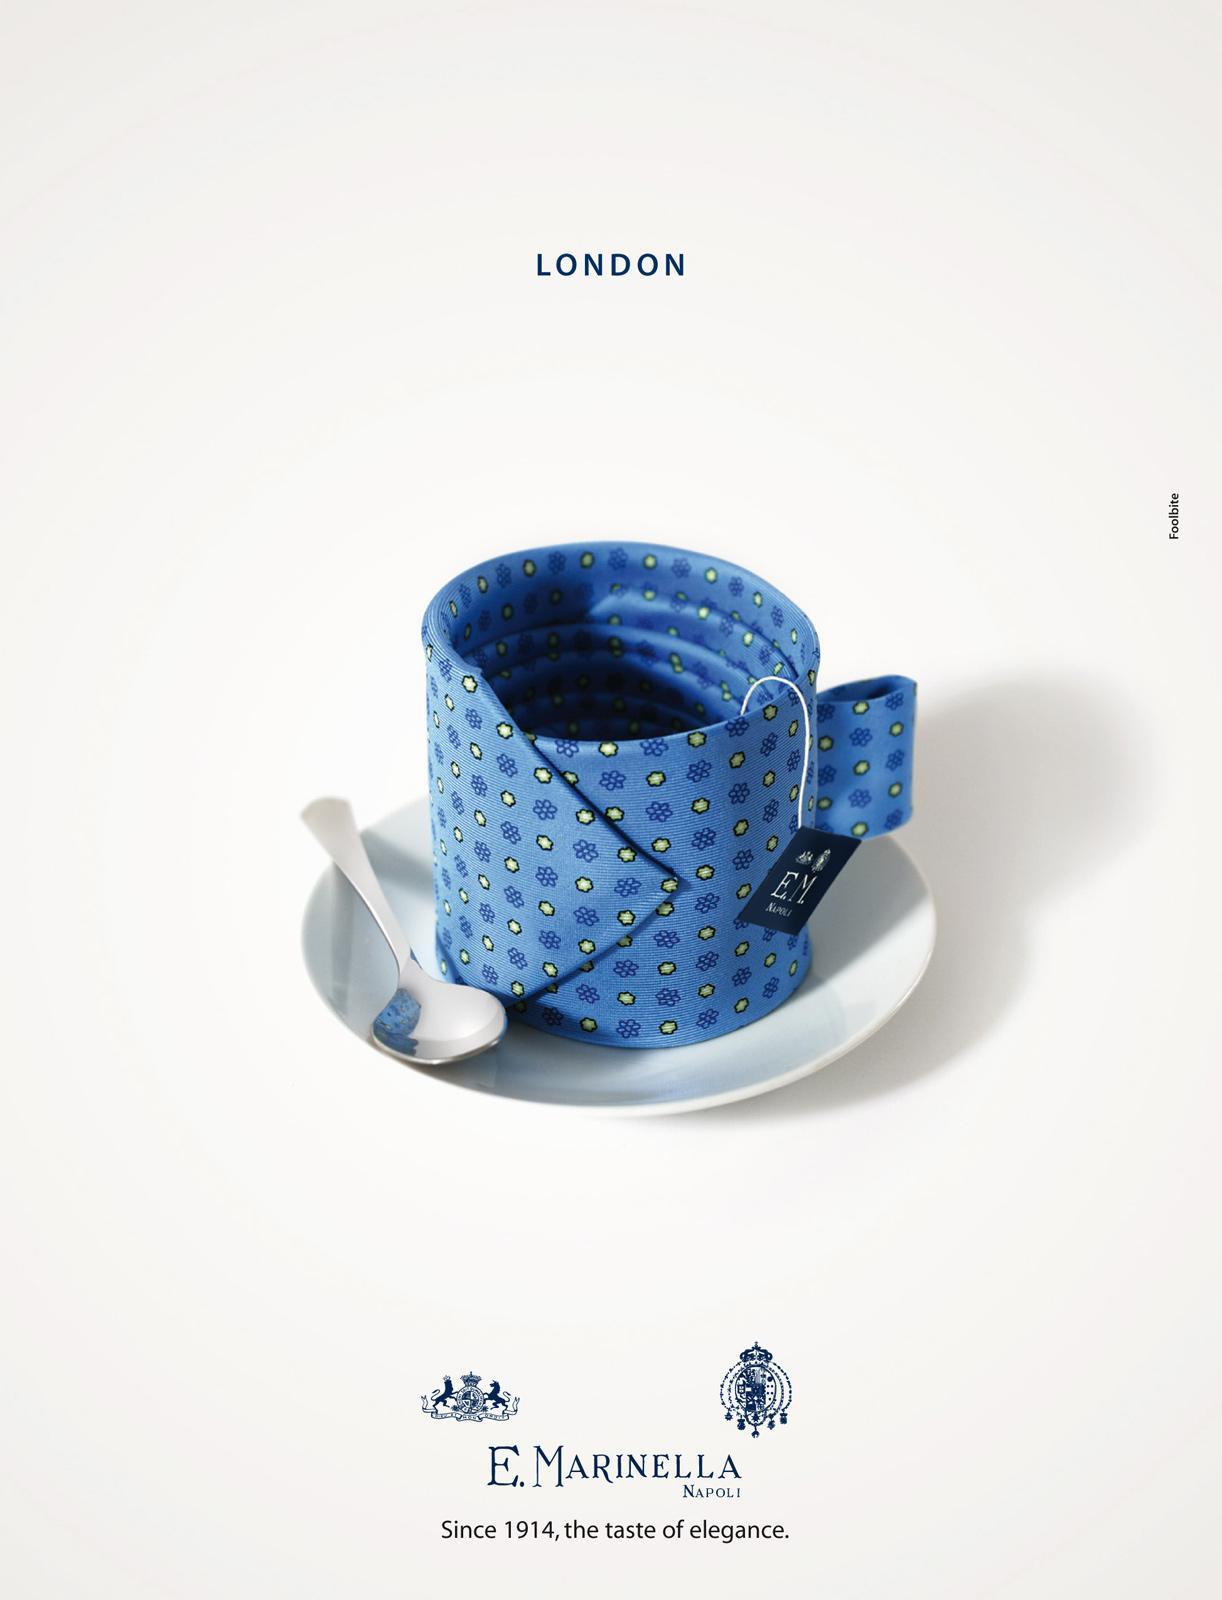 Marinella Print Ad -  London